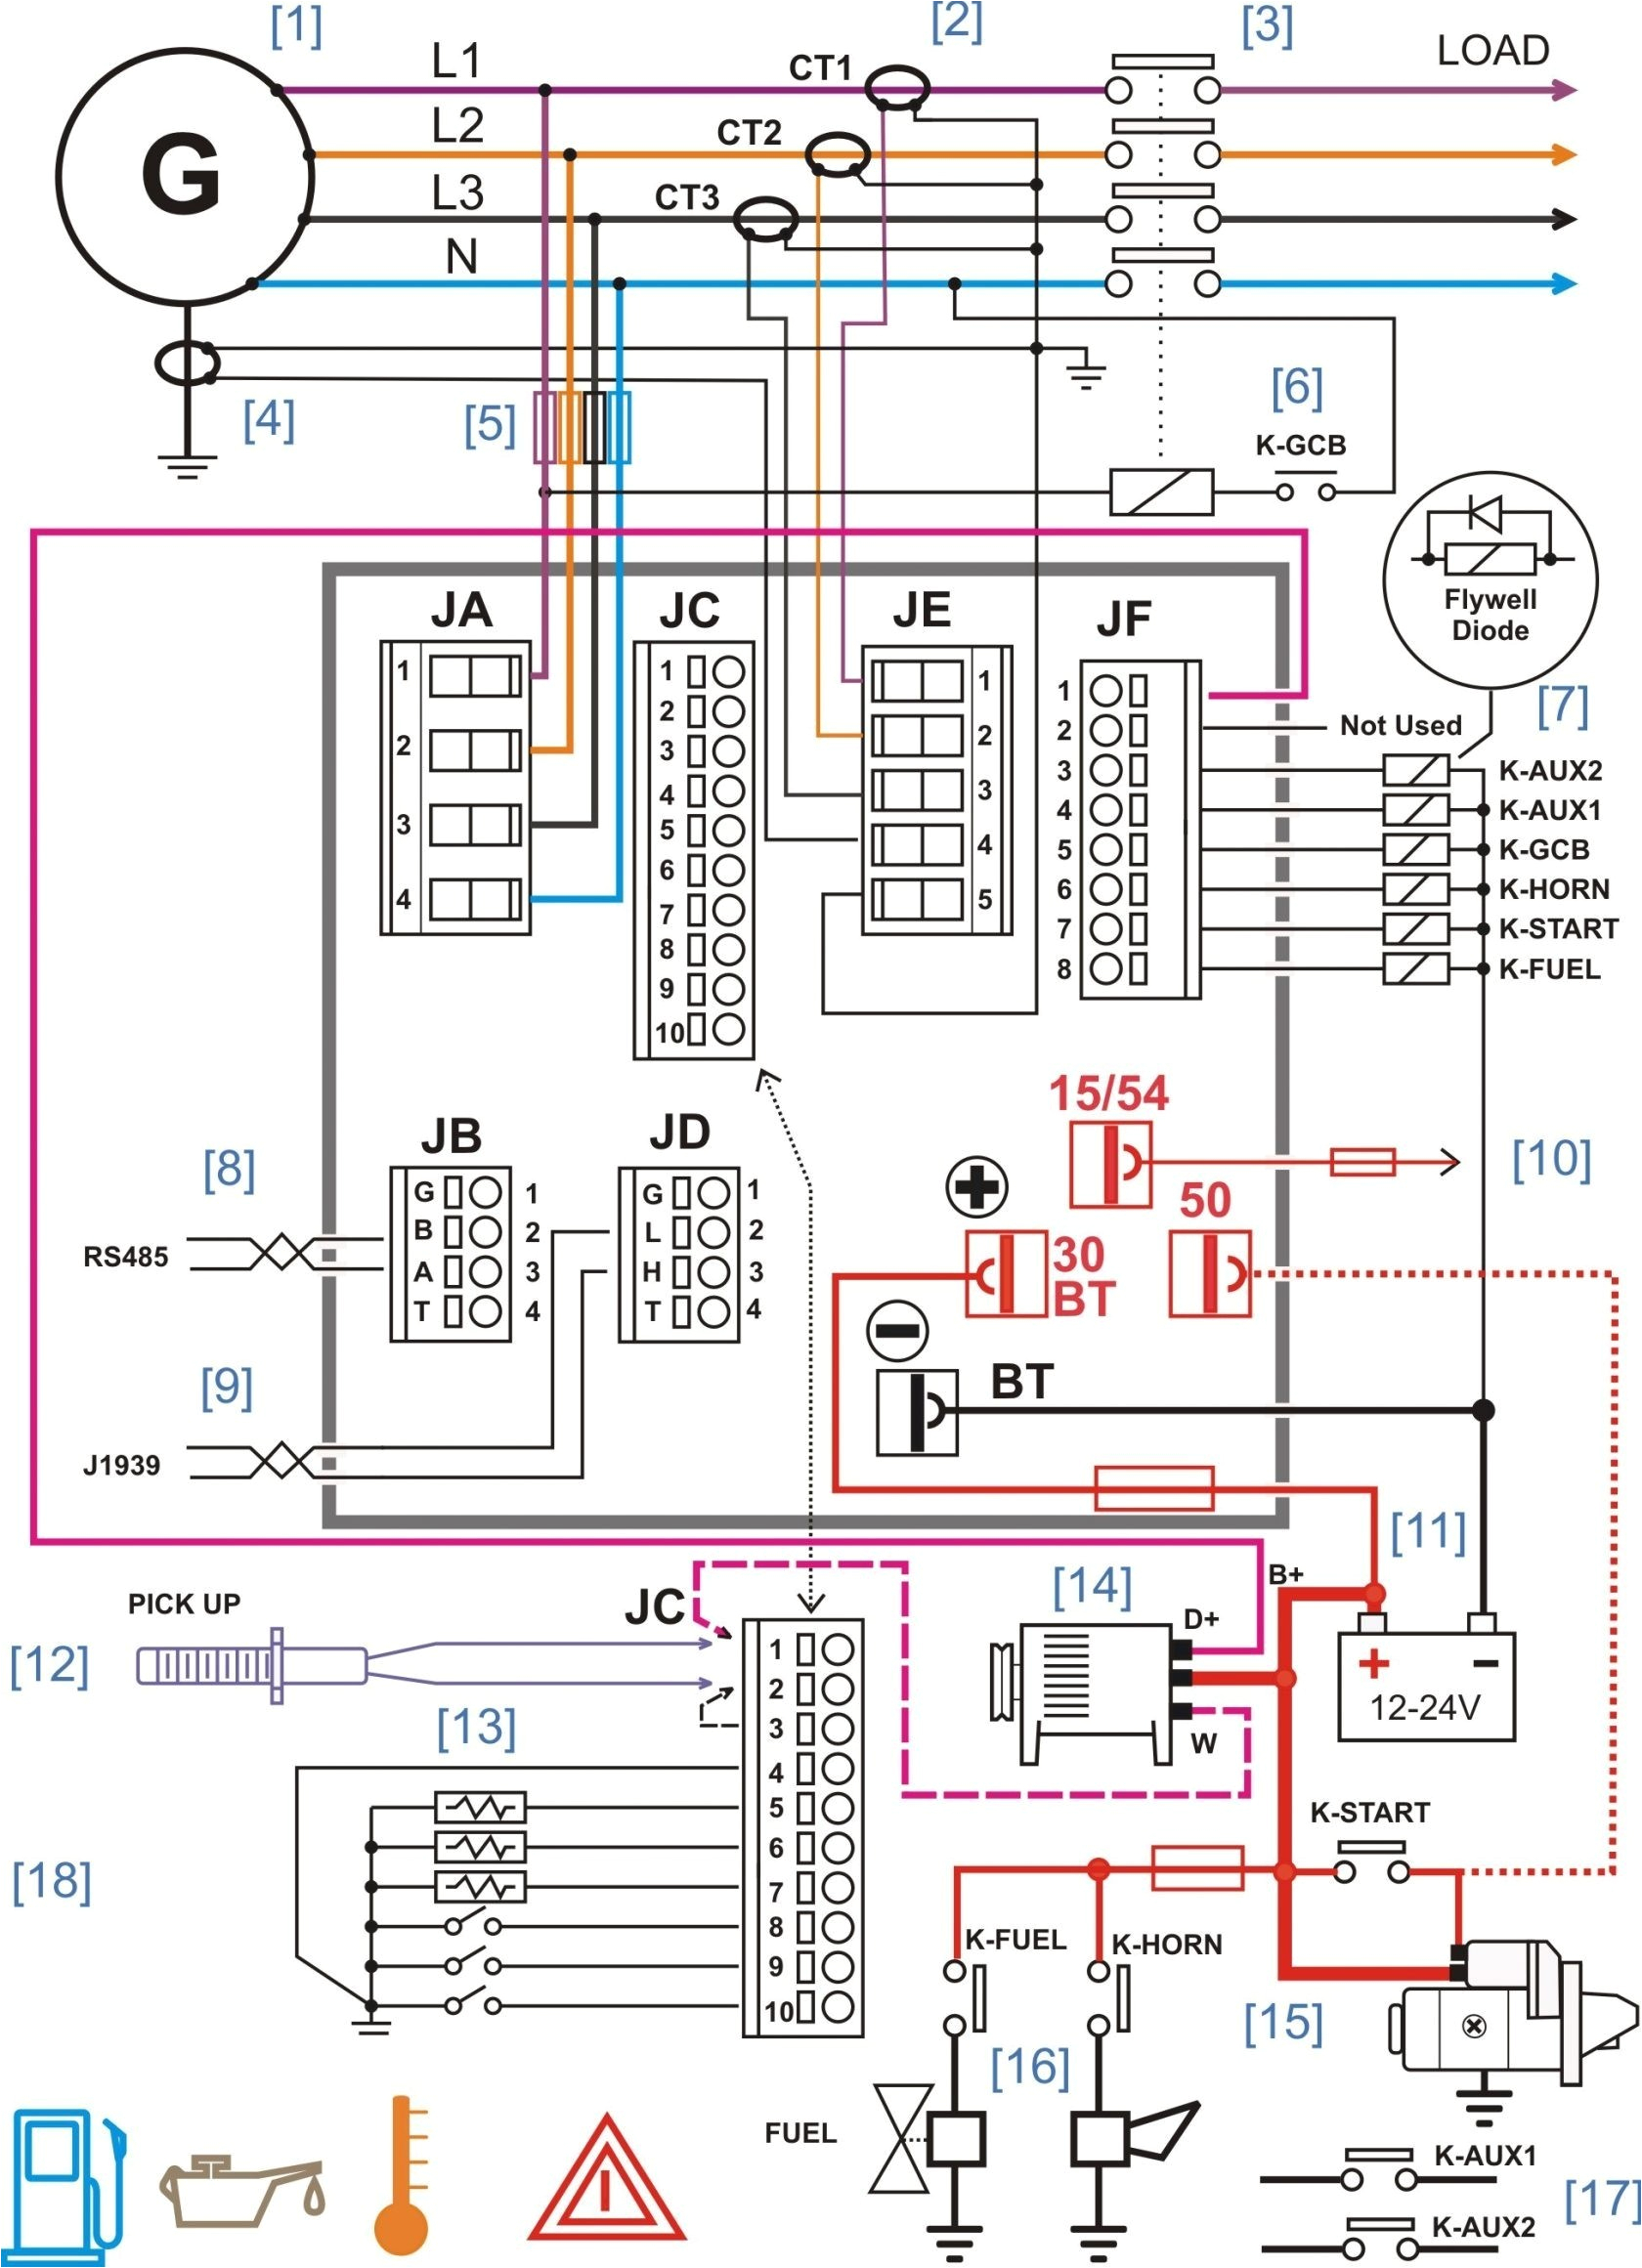 typical wiring diagram rv park wiring diagram datasource rv park wiring diagram